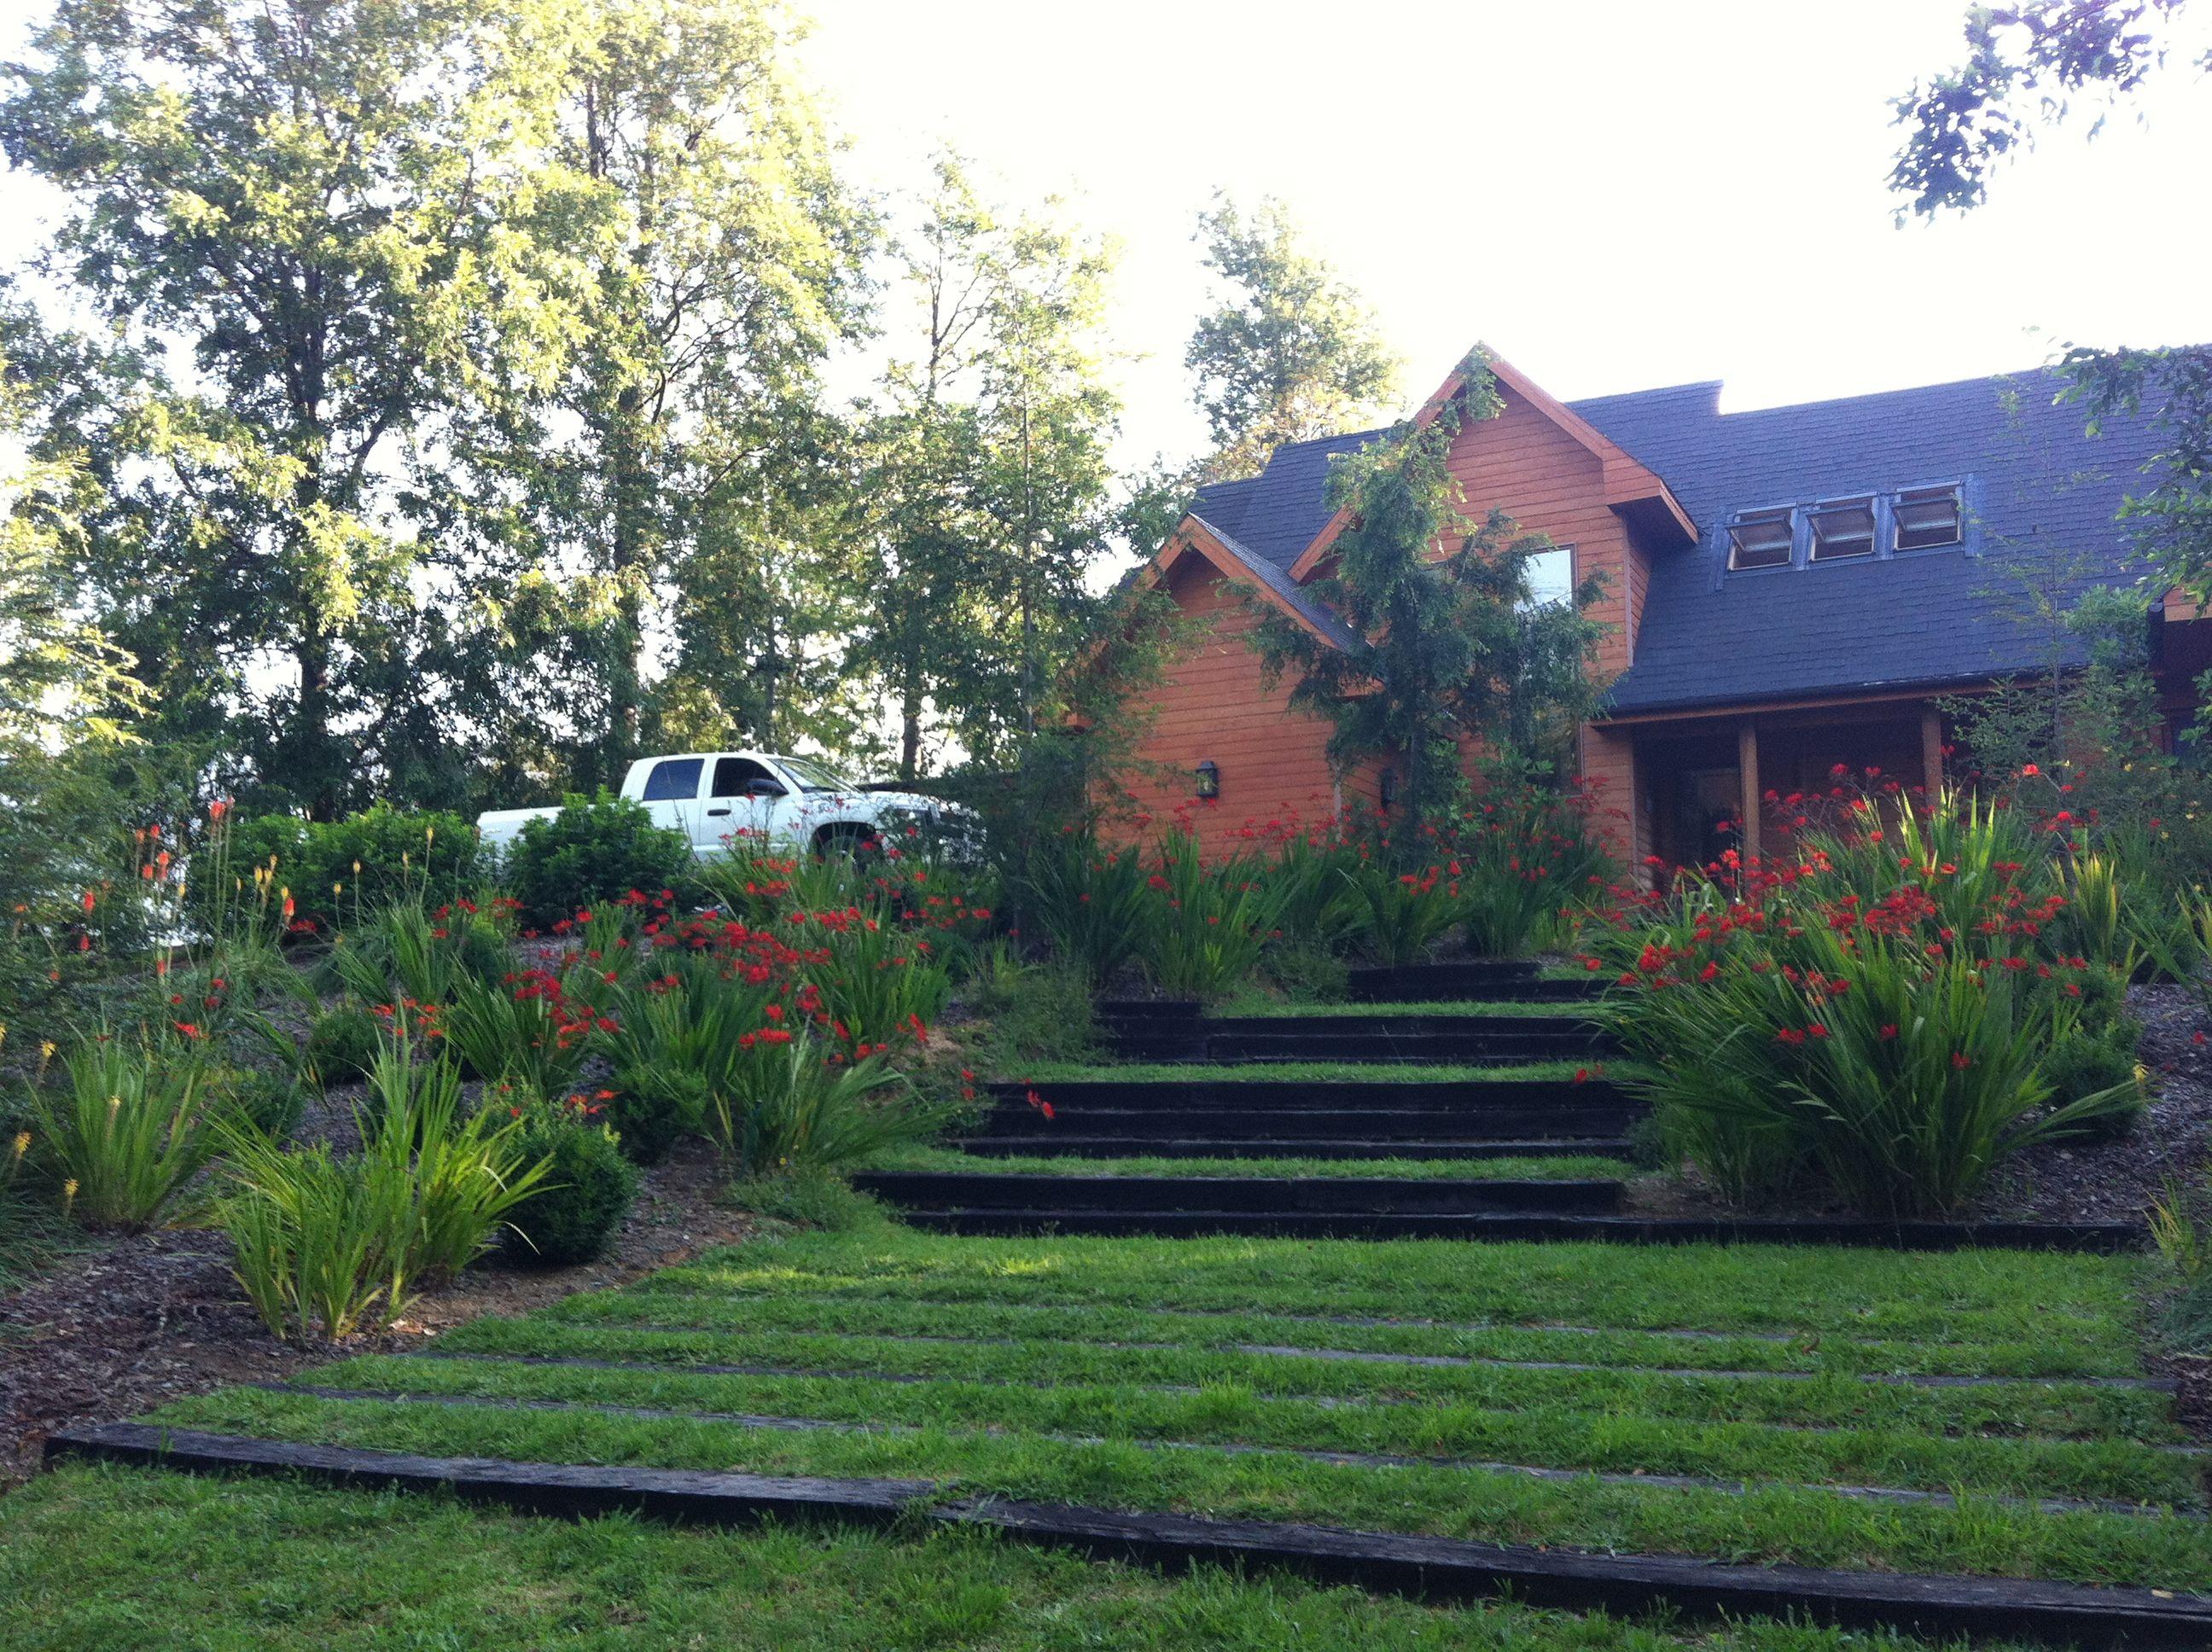 Casa calafquen sur de chile grupo alerce paisajismo for Paisajismo jardines casas